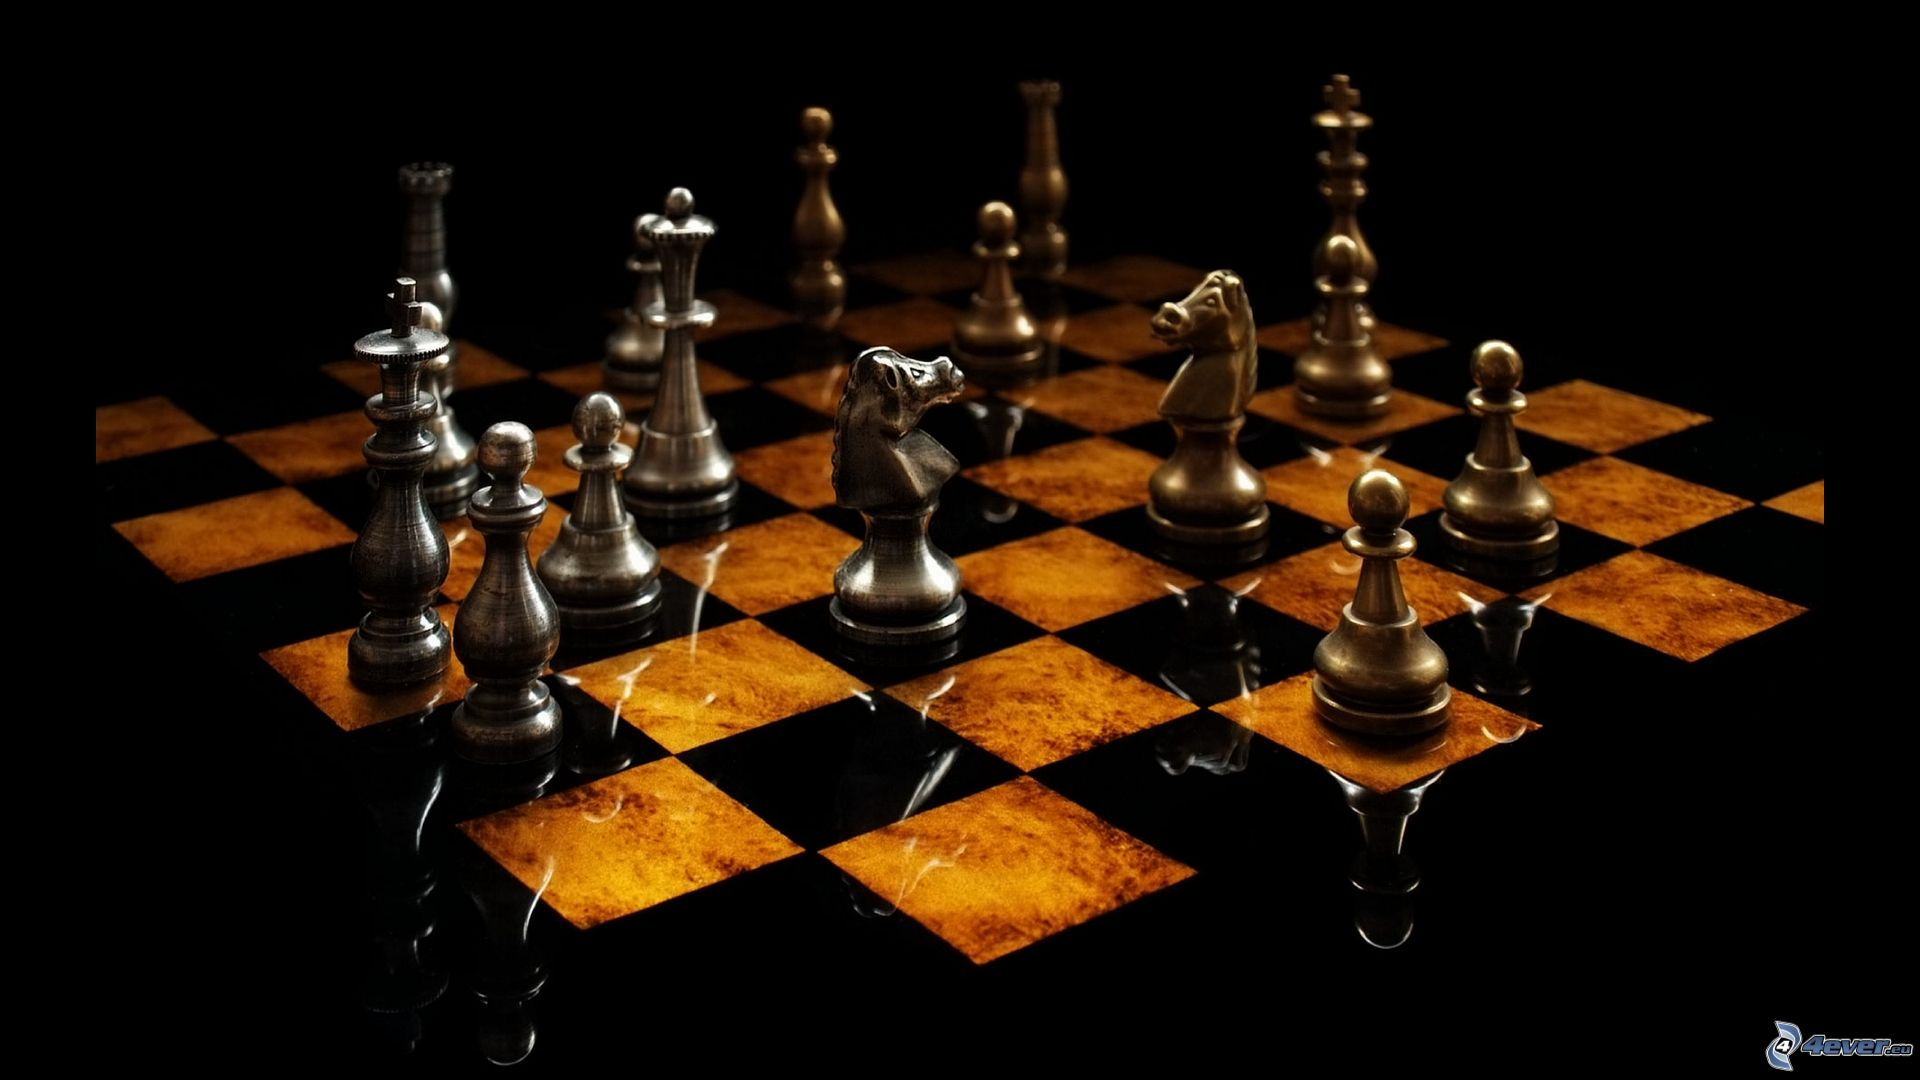 tablero-de-ajedrez,-ajedrez-189698